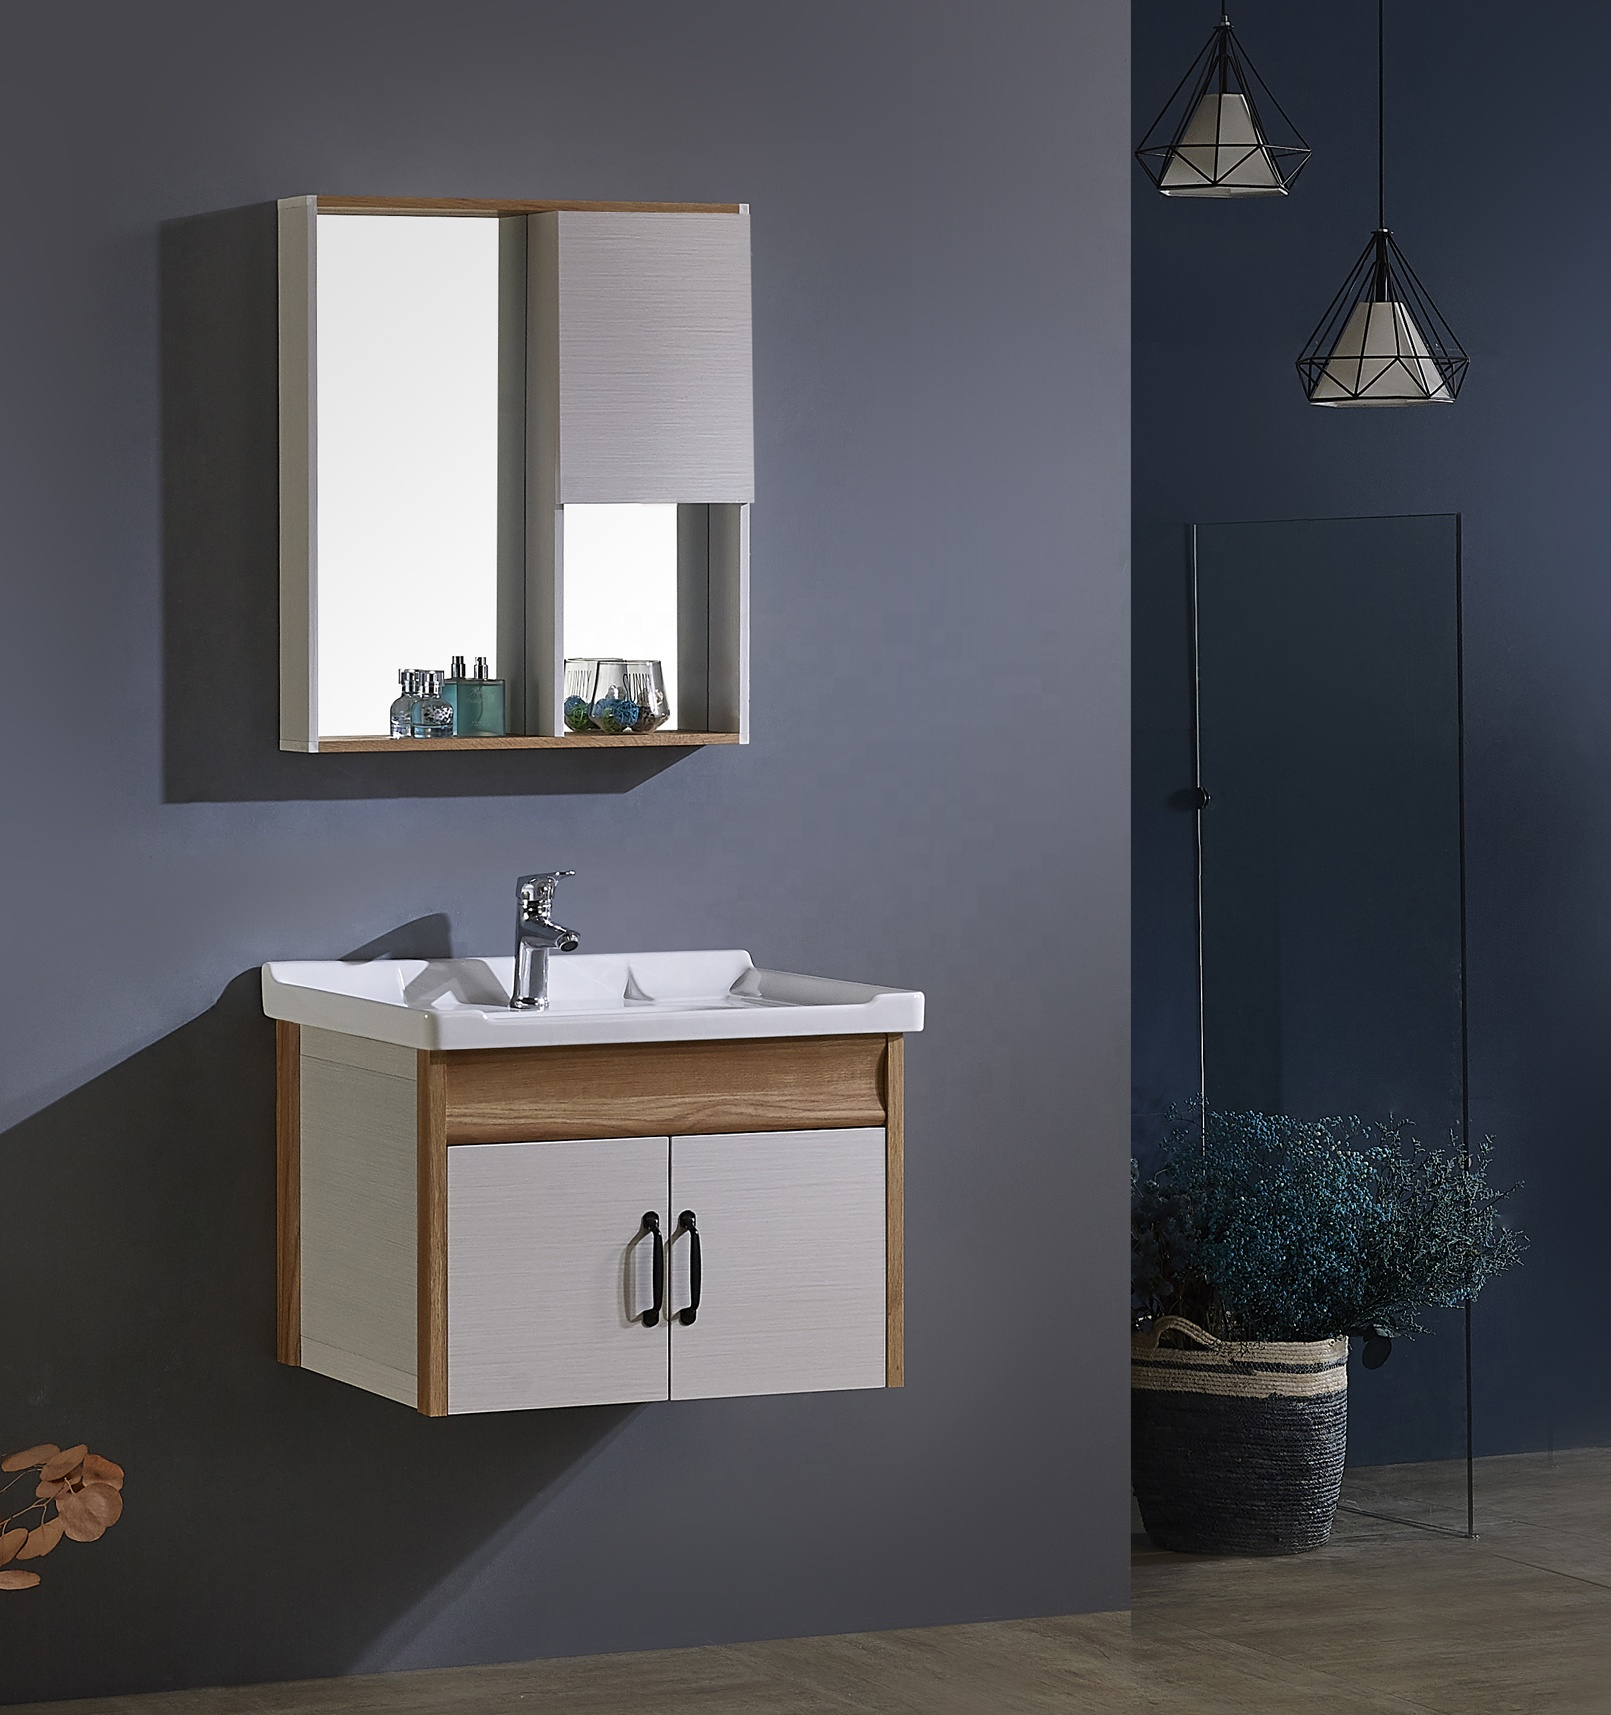 2020 factory wholesale storage aluminum vanity bathroom modern